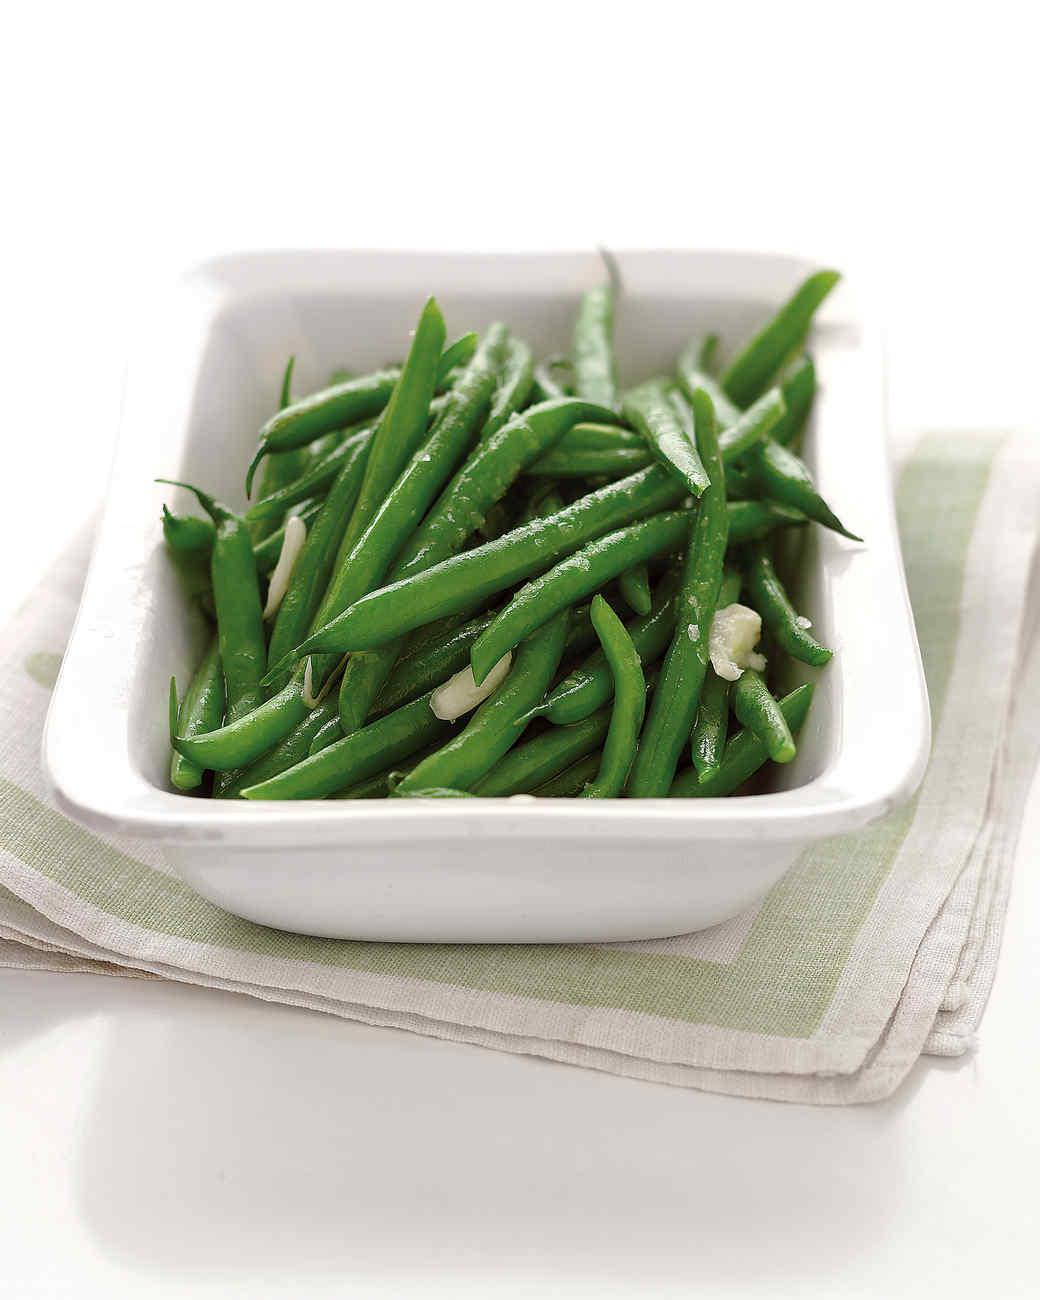 Microwave-Steamed Garlic Green Beans Recipe